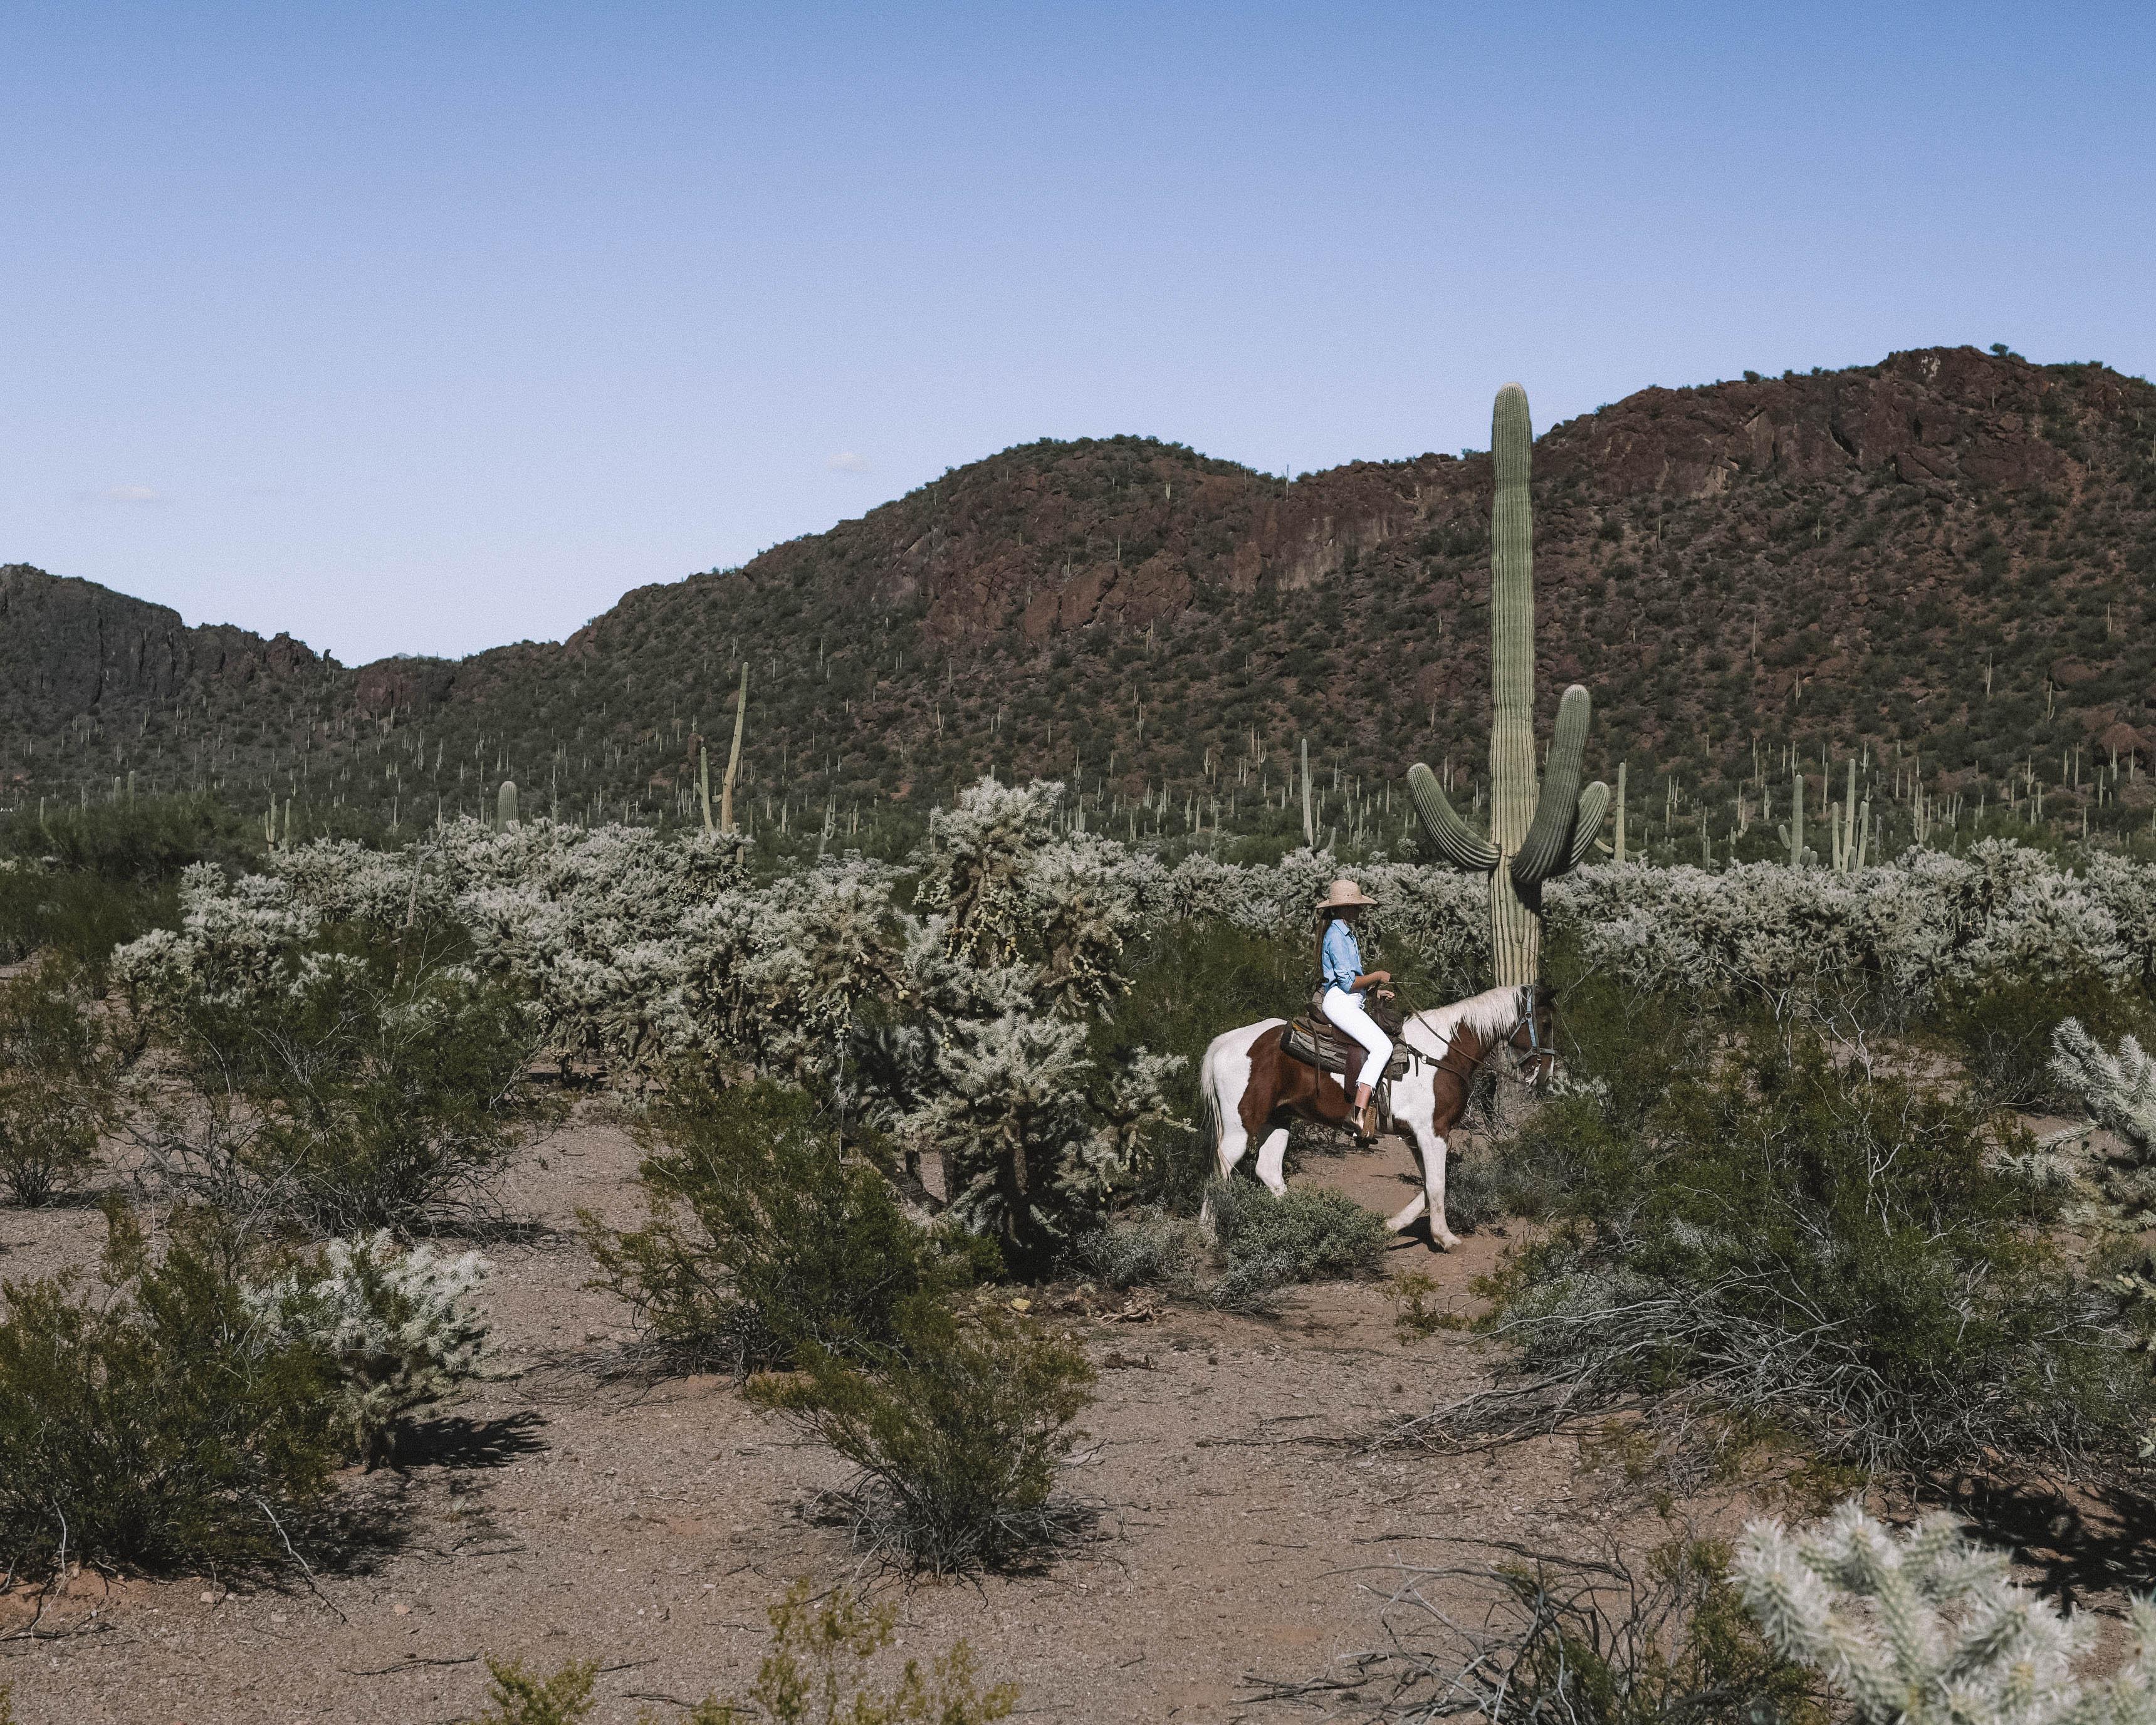 horse riding in Tucson